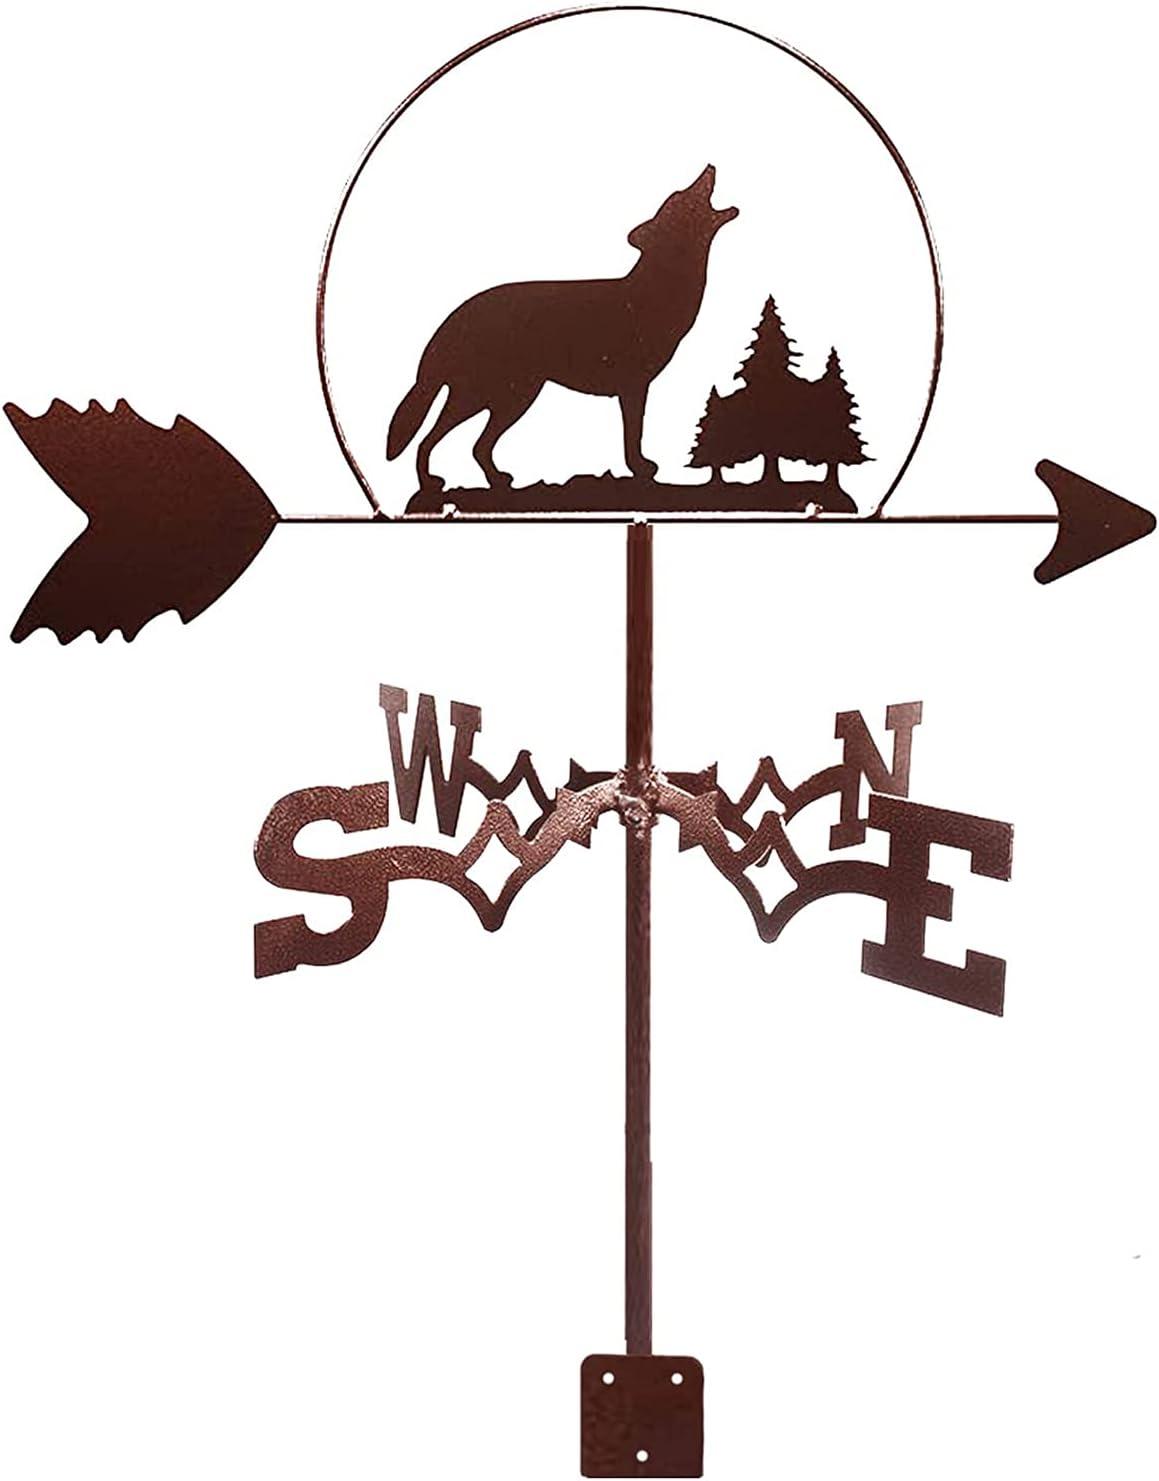 Animal Metal Weathervane Vintage Weather Wild Van Selling and selling Wolf Tucson Mall Vane Wind